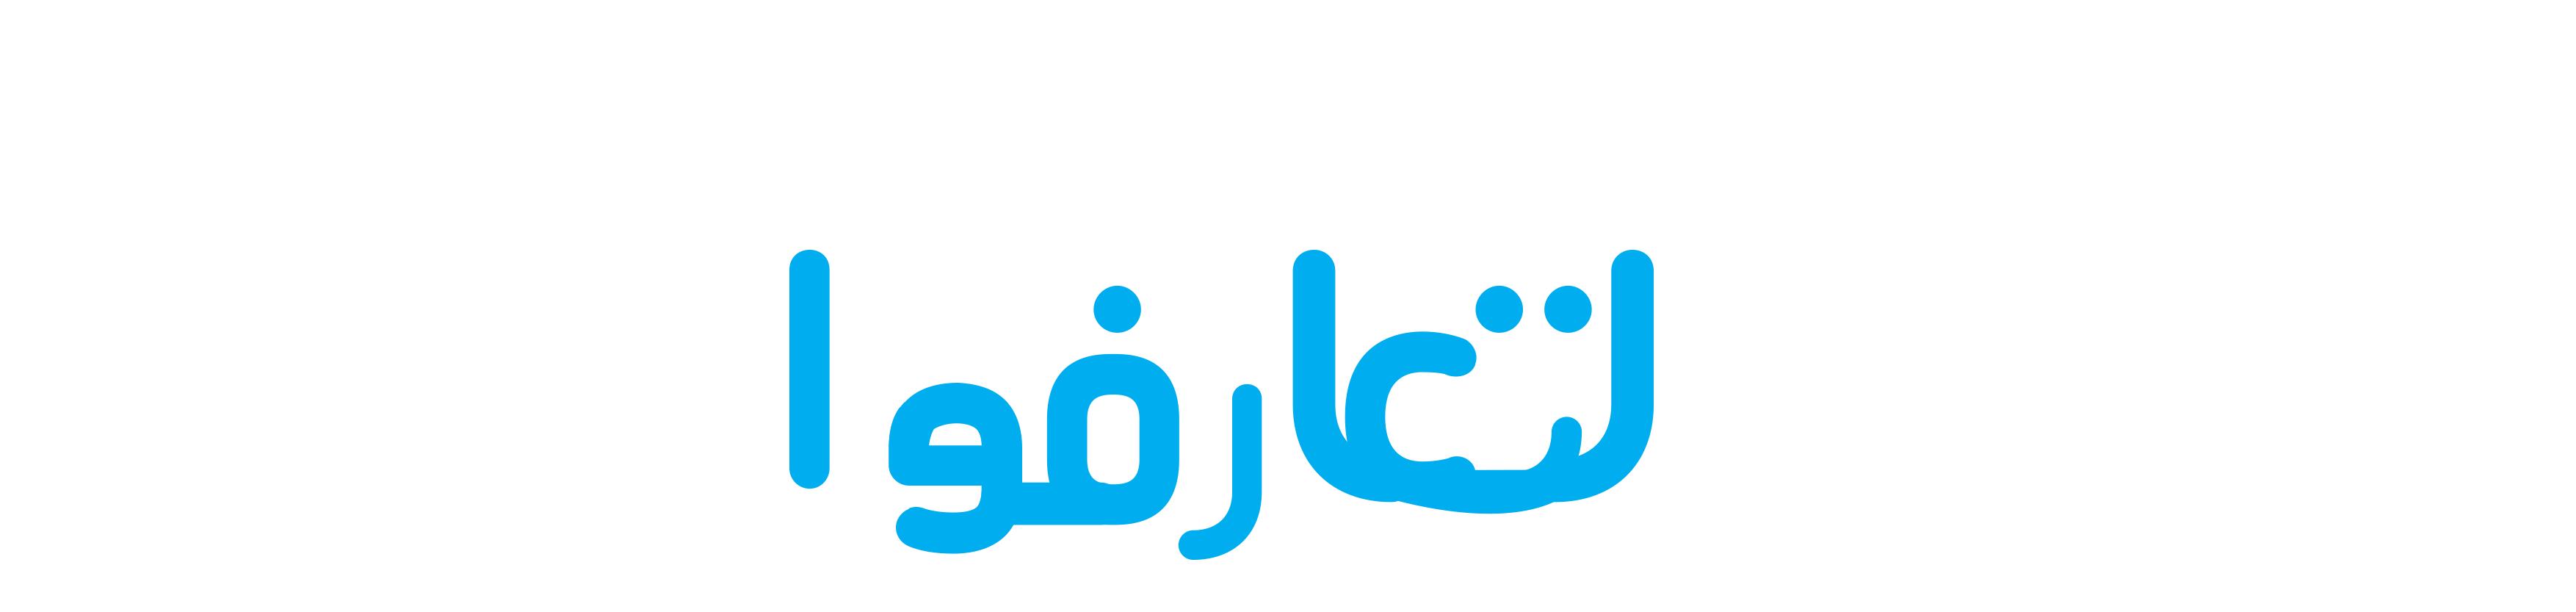 litaearafuu main logo momenarts